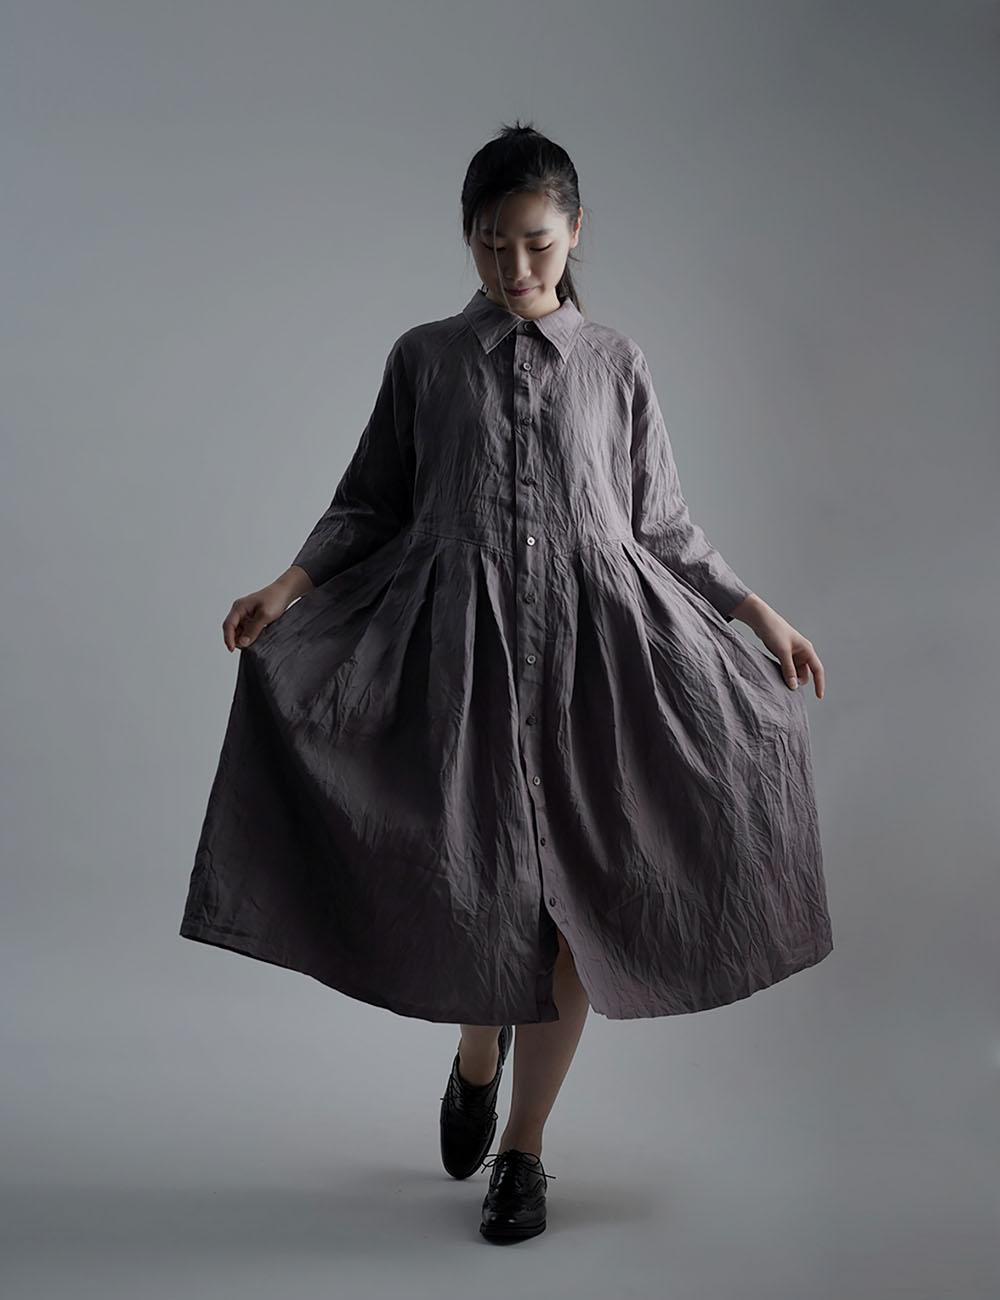 【wafu】Linen Dress 超高密度リネン ワンピース / 茶鼠(ちゃねずみ) a013j-cnz1